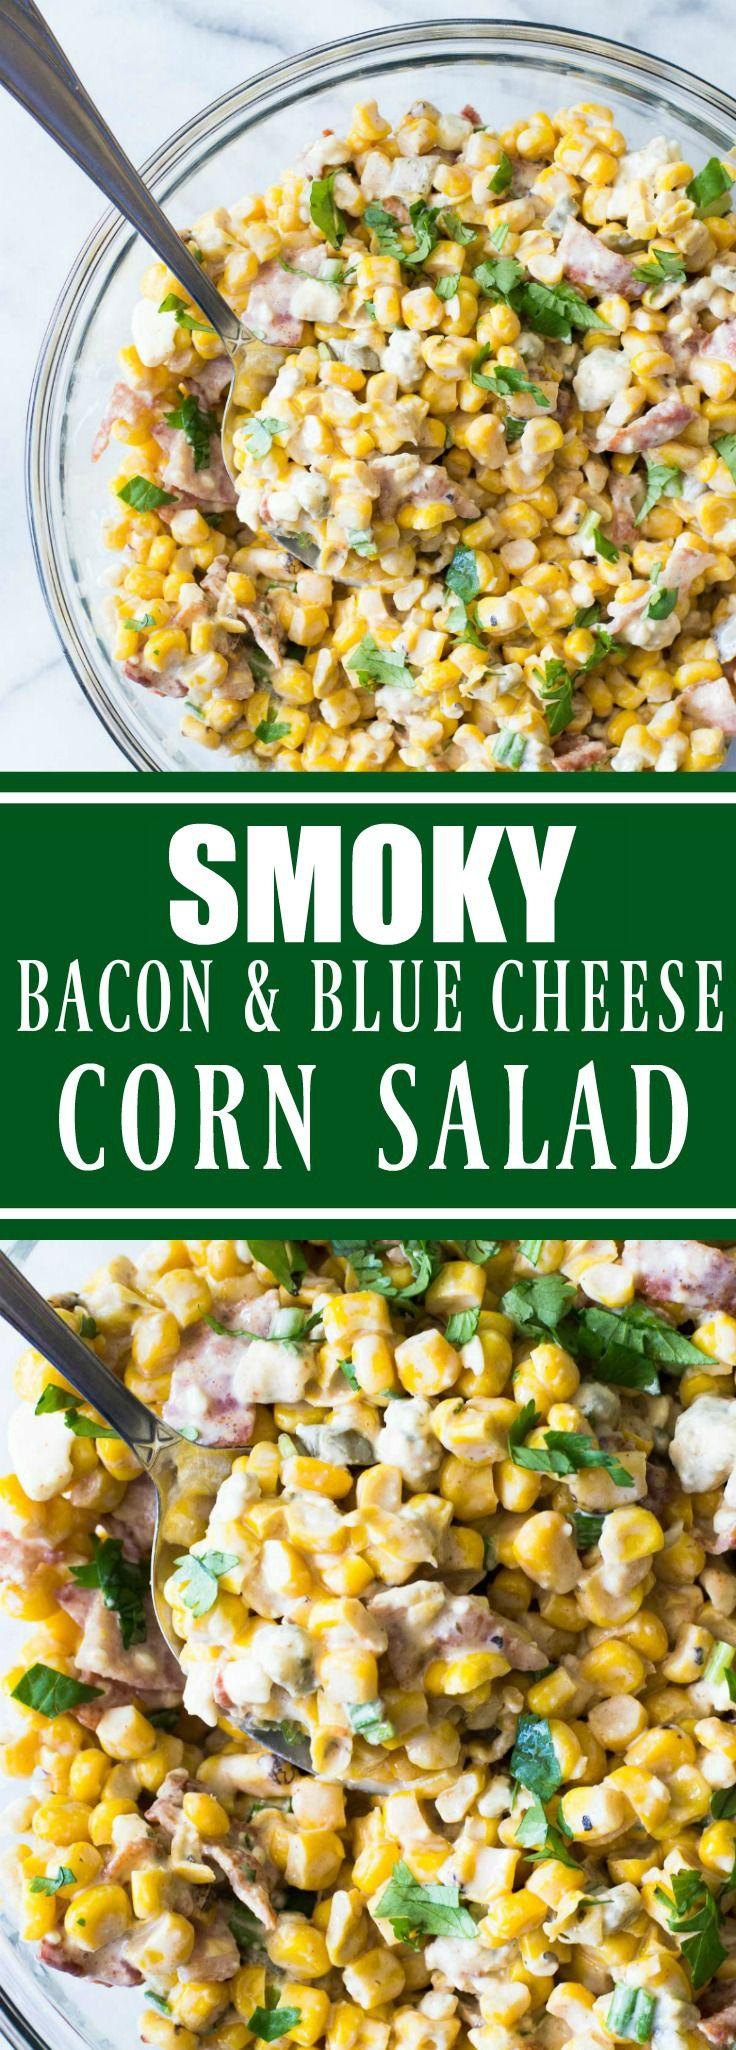 Smoky Bacon & Blue Cheese Corn Salad